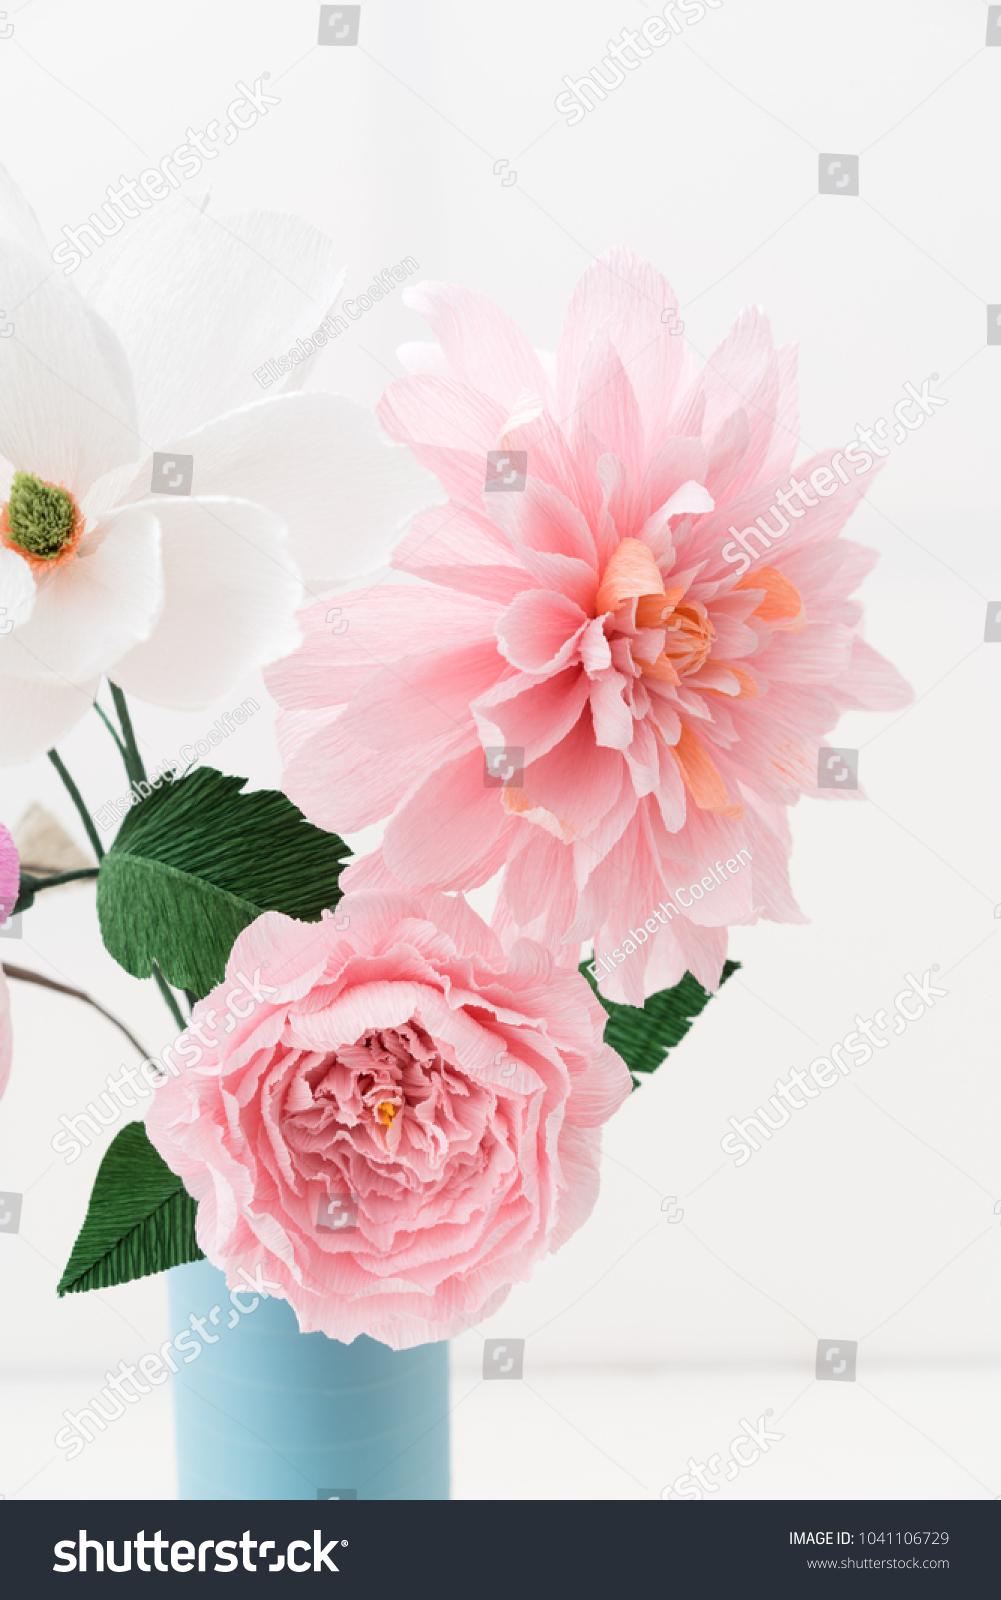 Crepe Paper Flower Bouquet Peonies Dahlia Stock Photo (Edit Now ...